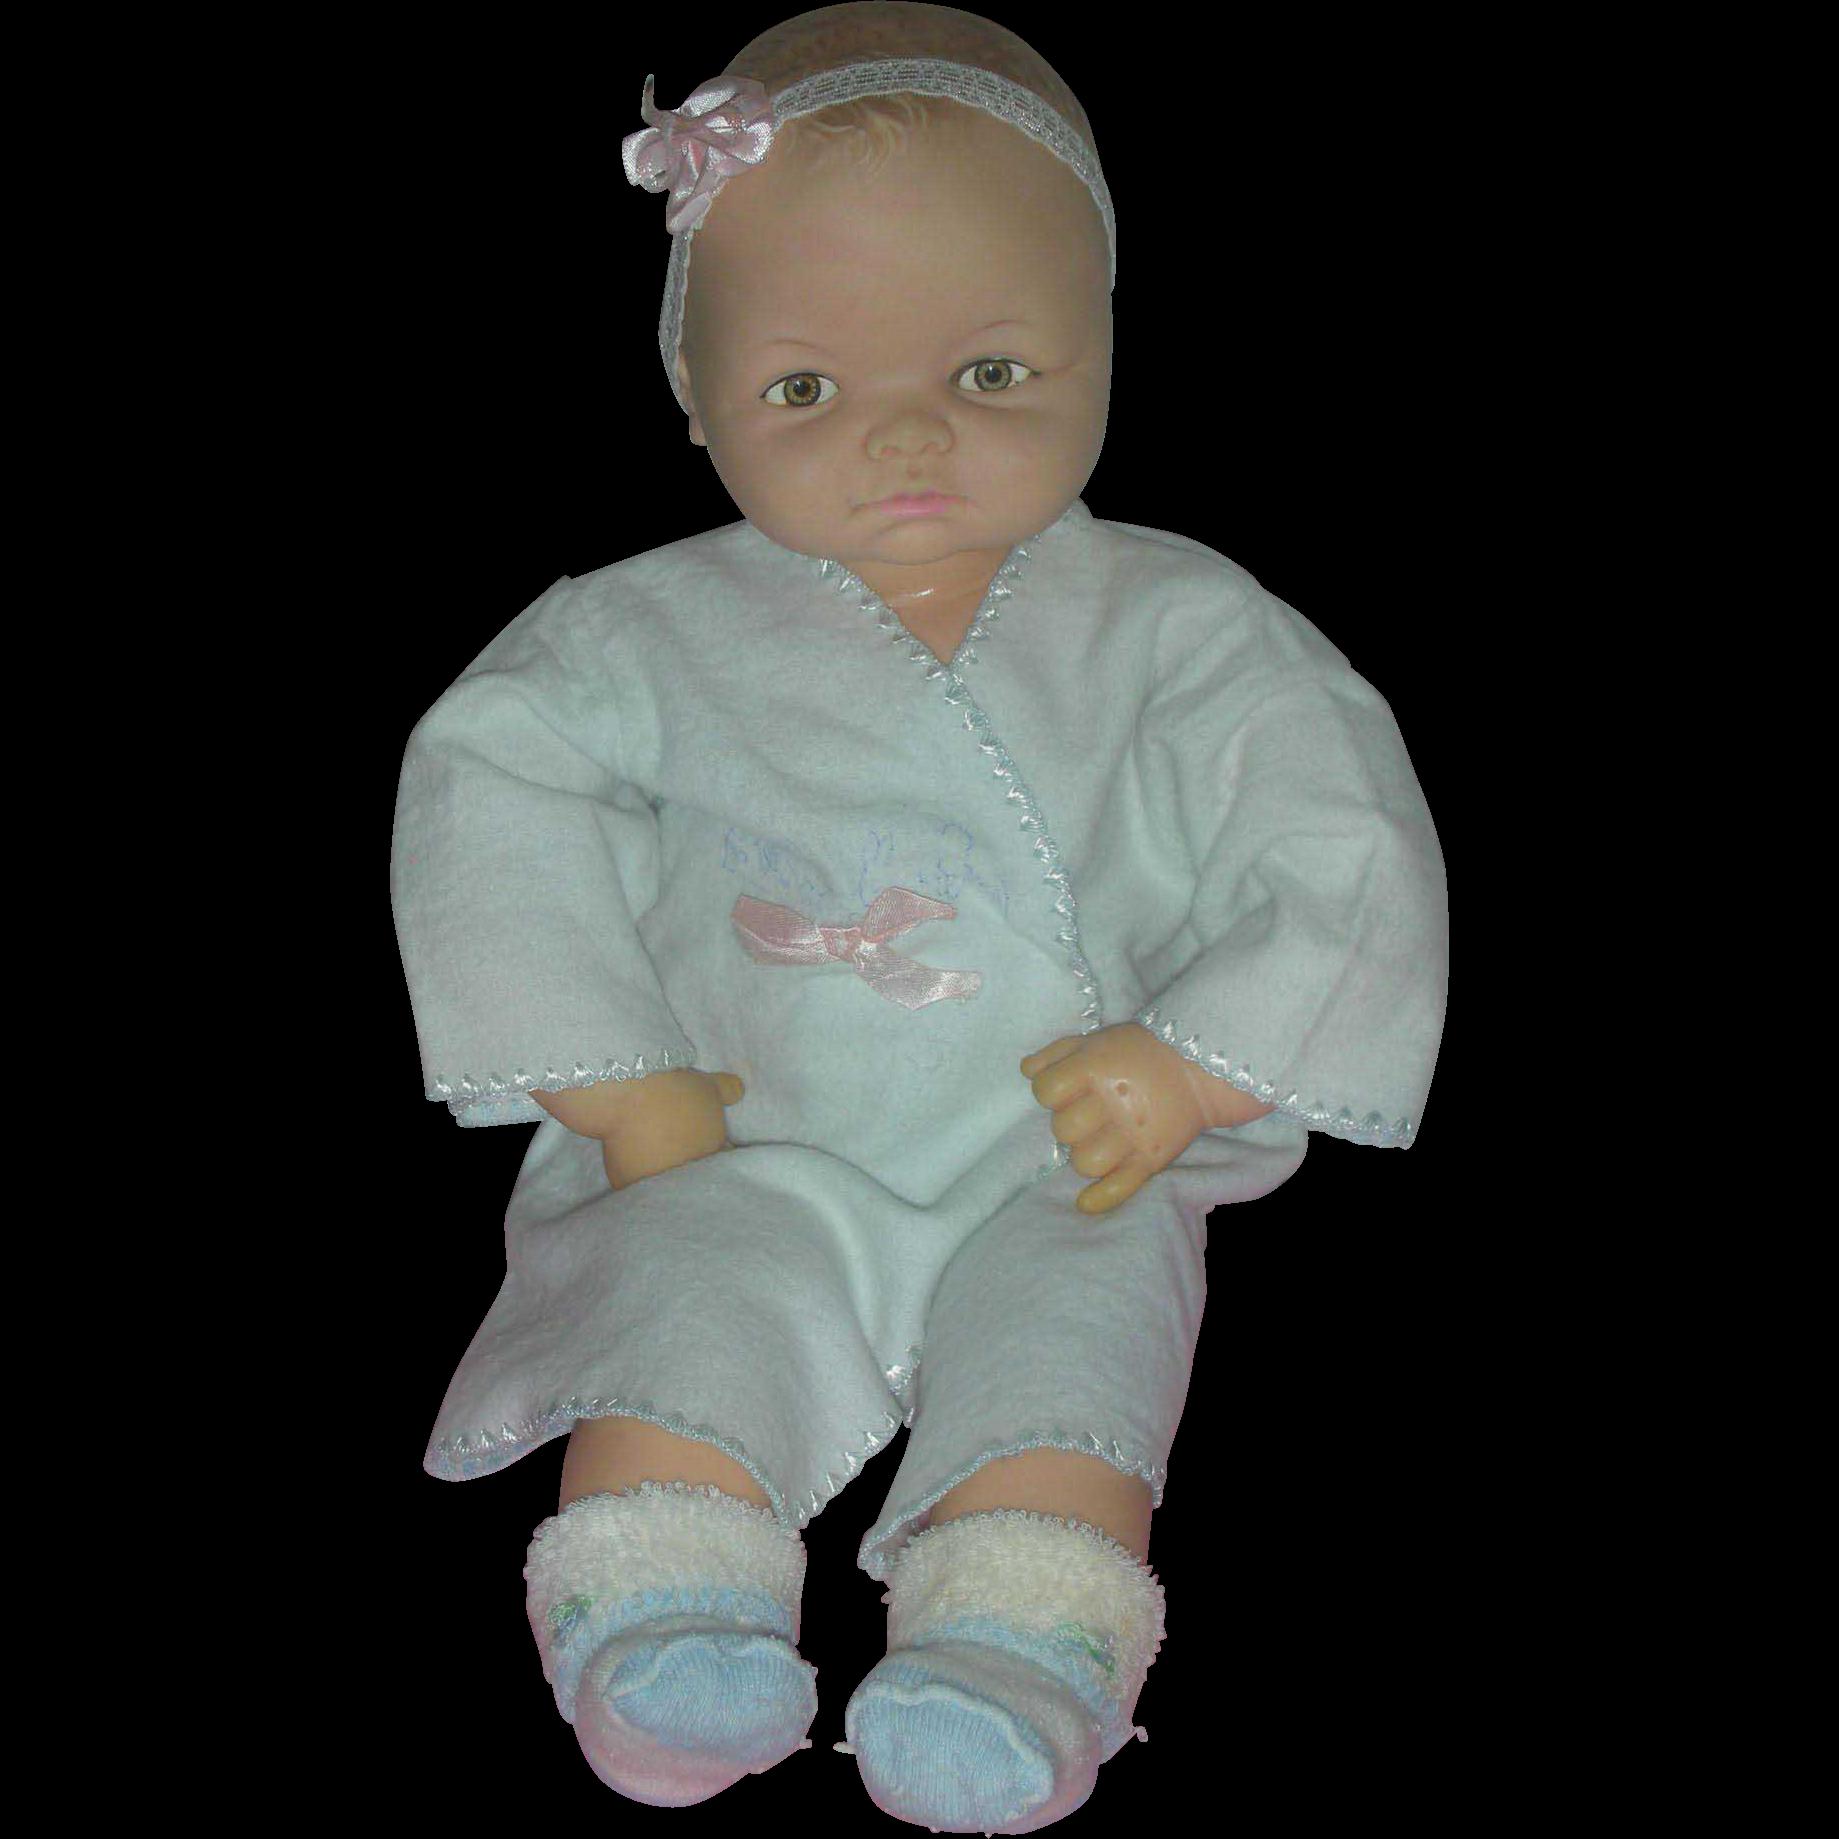 Vintage:Doll:Cameo:Miss Peep:Dolls:Baby